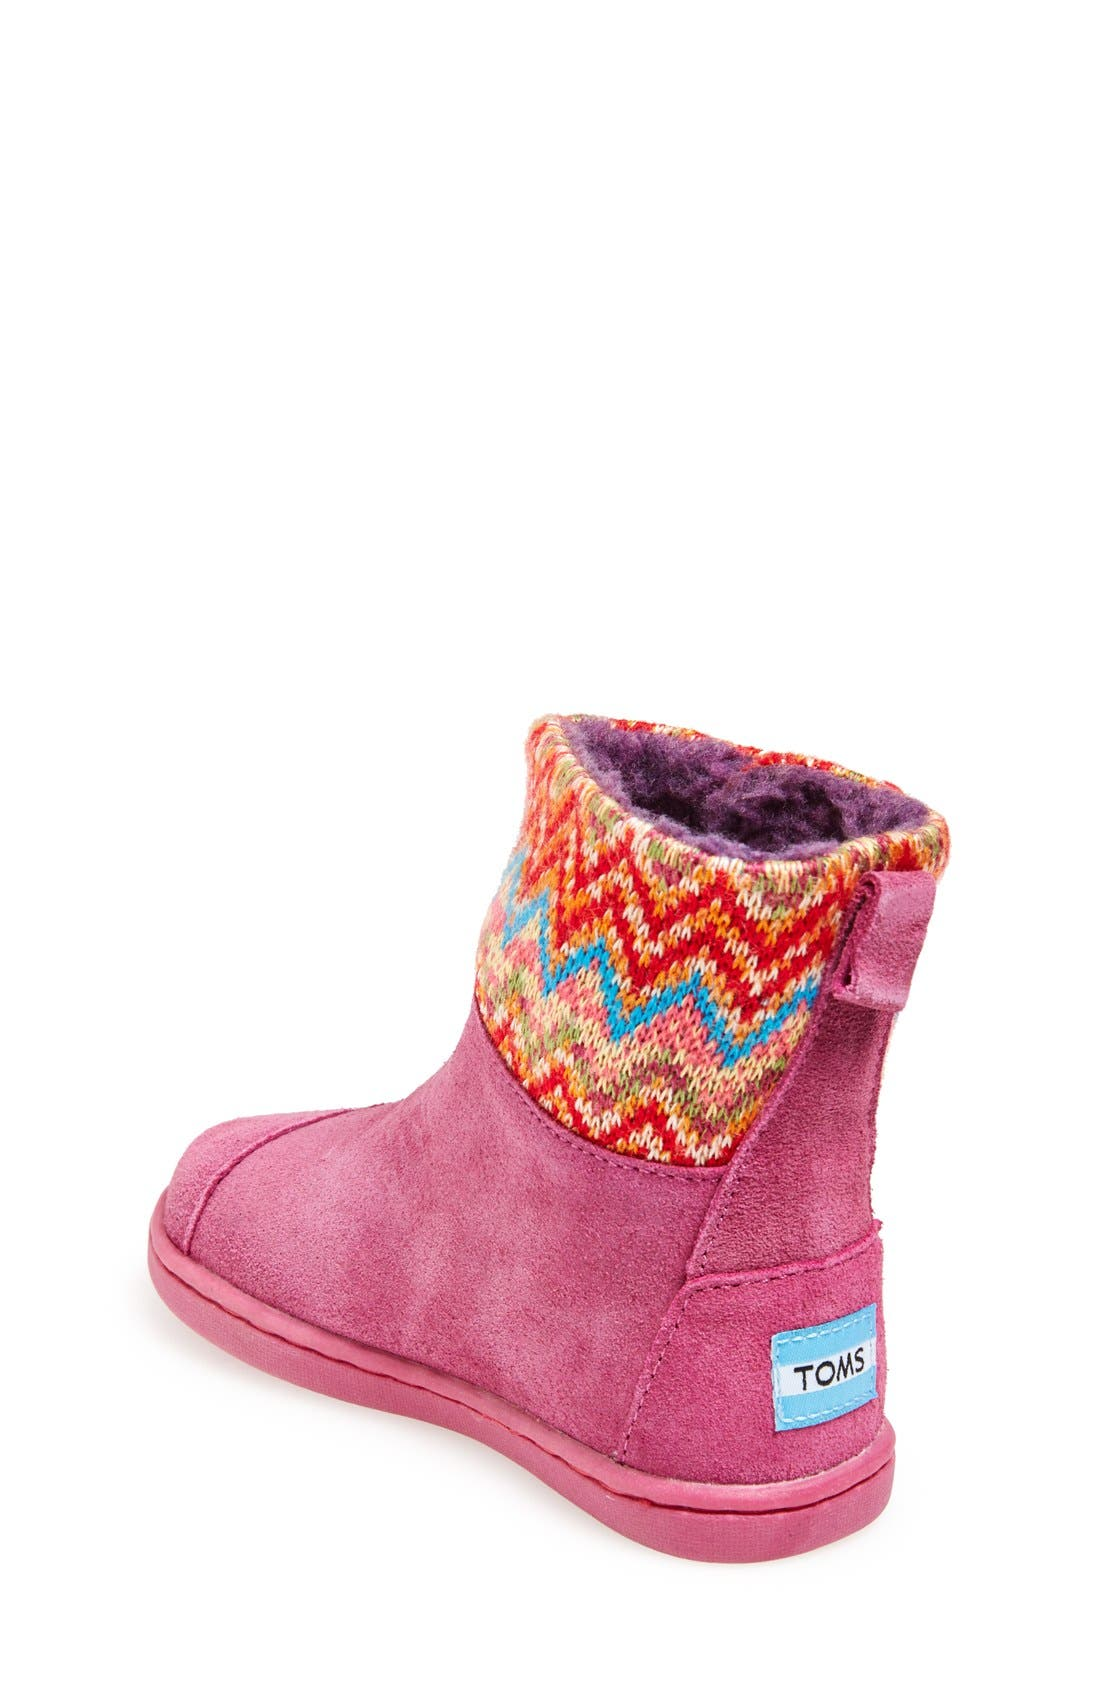 'Nepal - Tiny' Boot,                             Alternate thumbnail 2, color,                             Pink Multi Zigzag